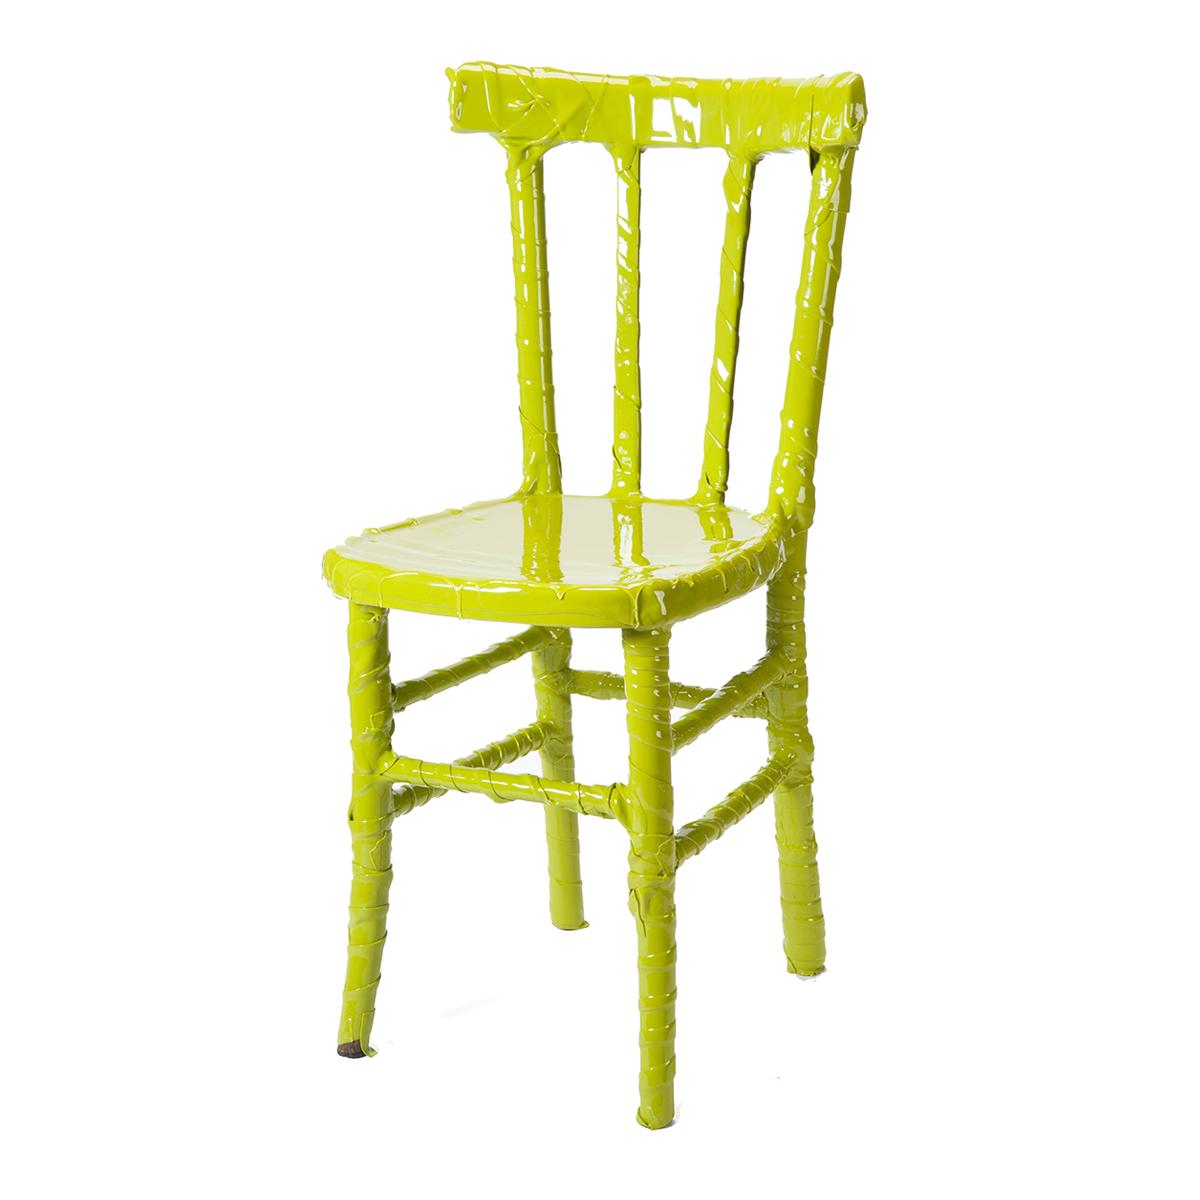 Chair-N.-06-20.jpg